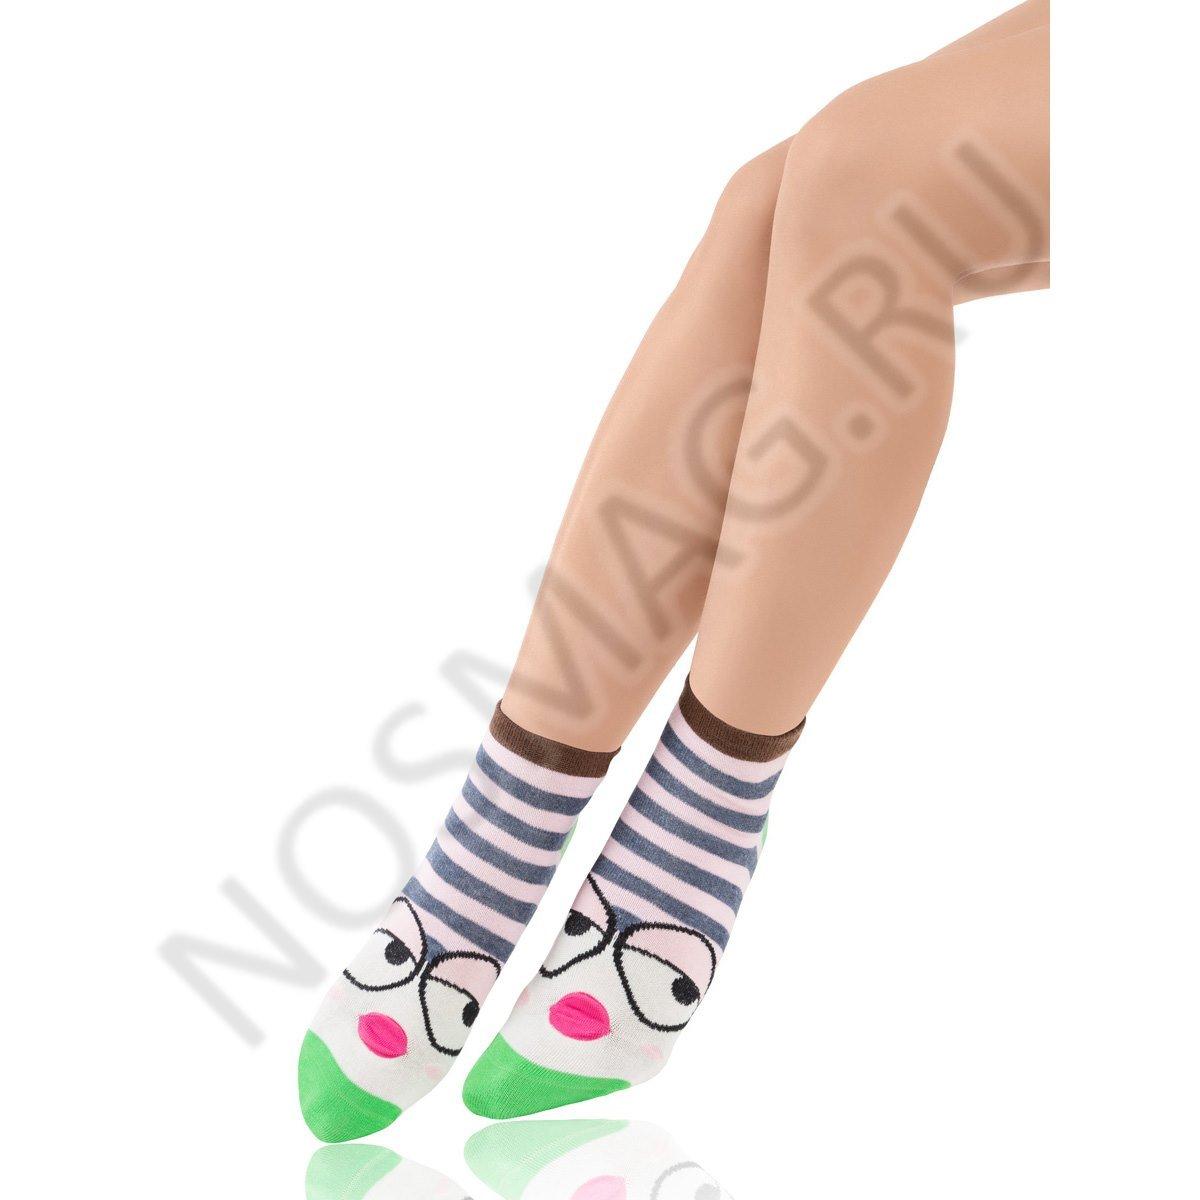 Носки детские хлопковые Charmante розовые/зеленые